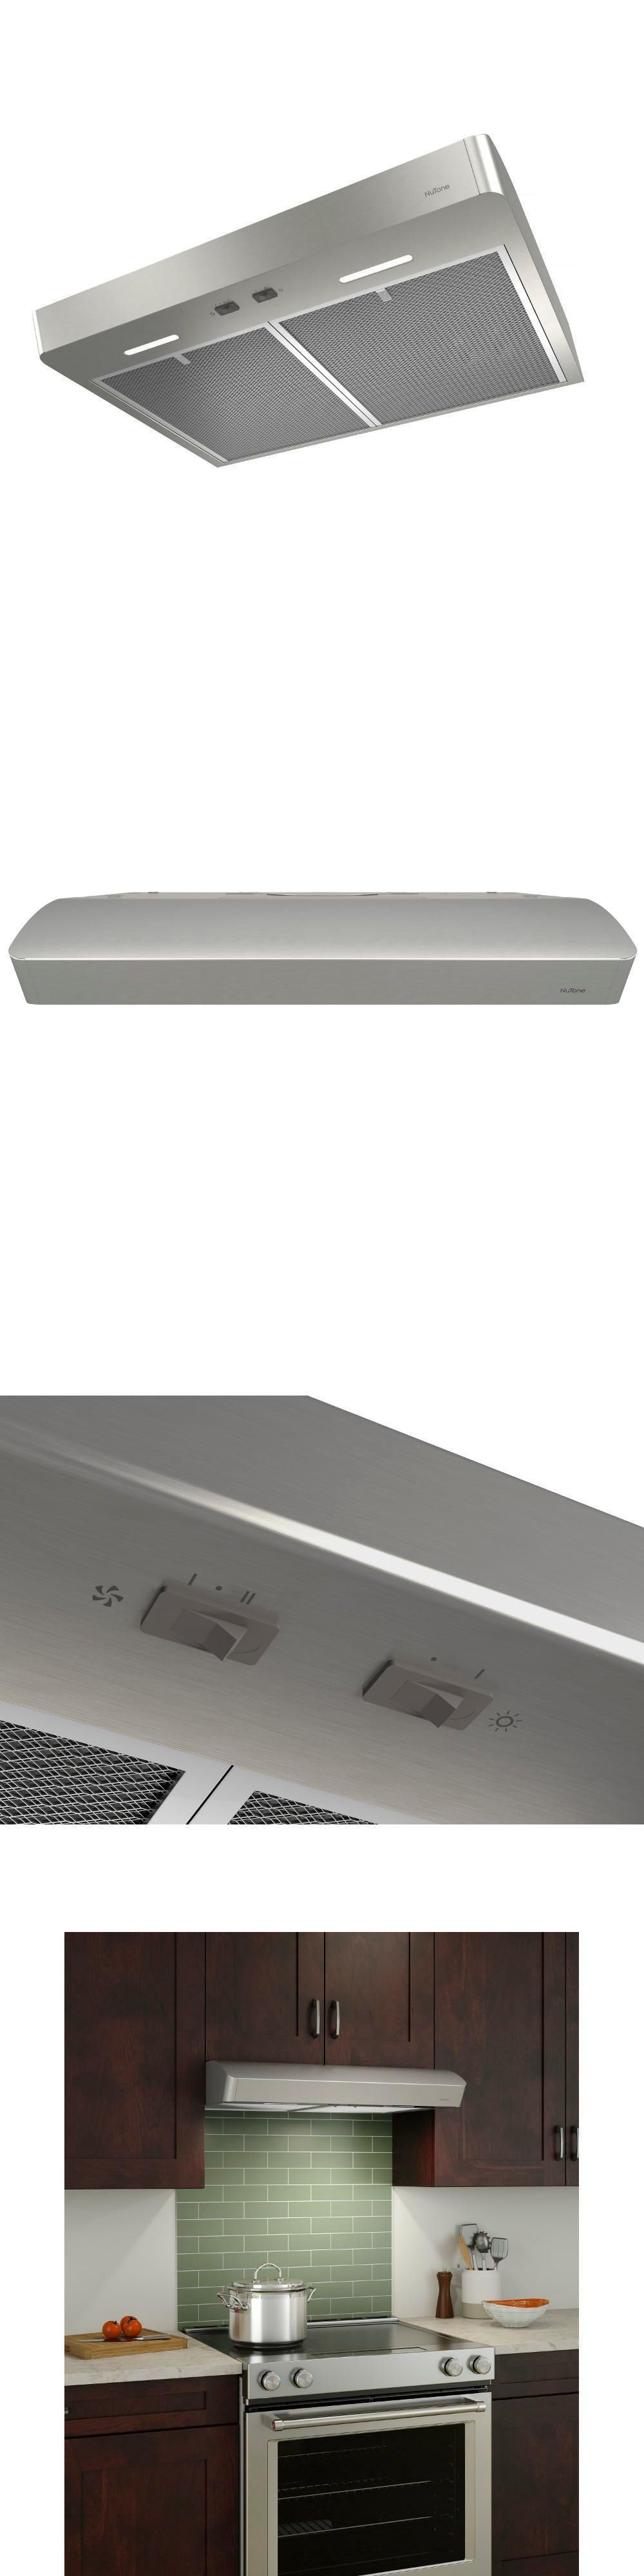 Range Hoods 71253 Nutone Convertible Range Hood Under Cabinet Kitchen 36 Inch Vent Stainless Steel Buy It Now Only 107 99 On Range Hoods Range Hood Broan